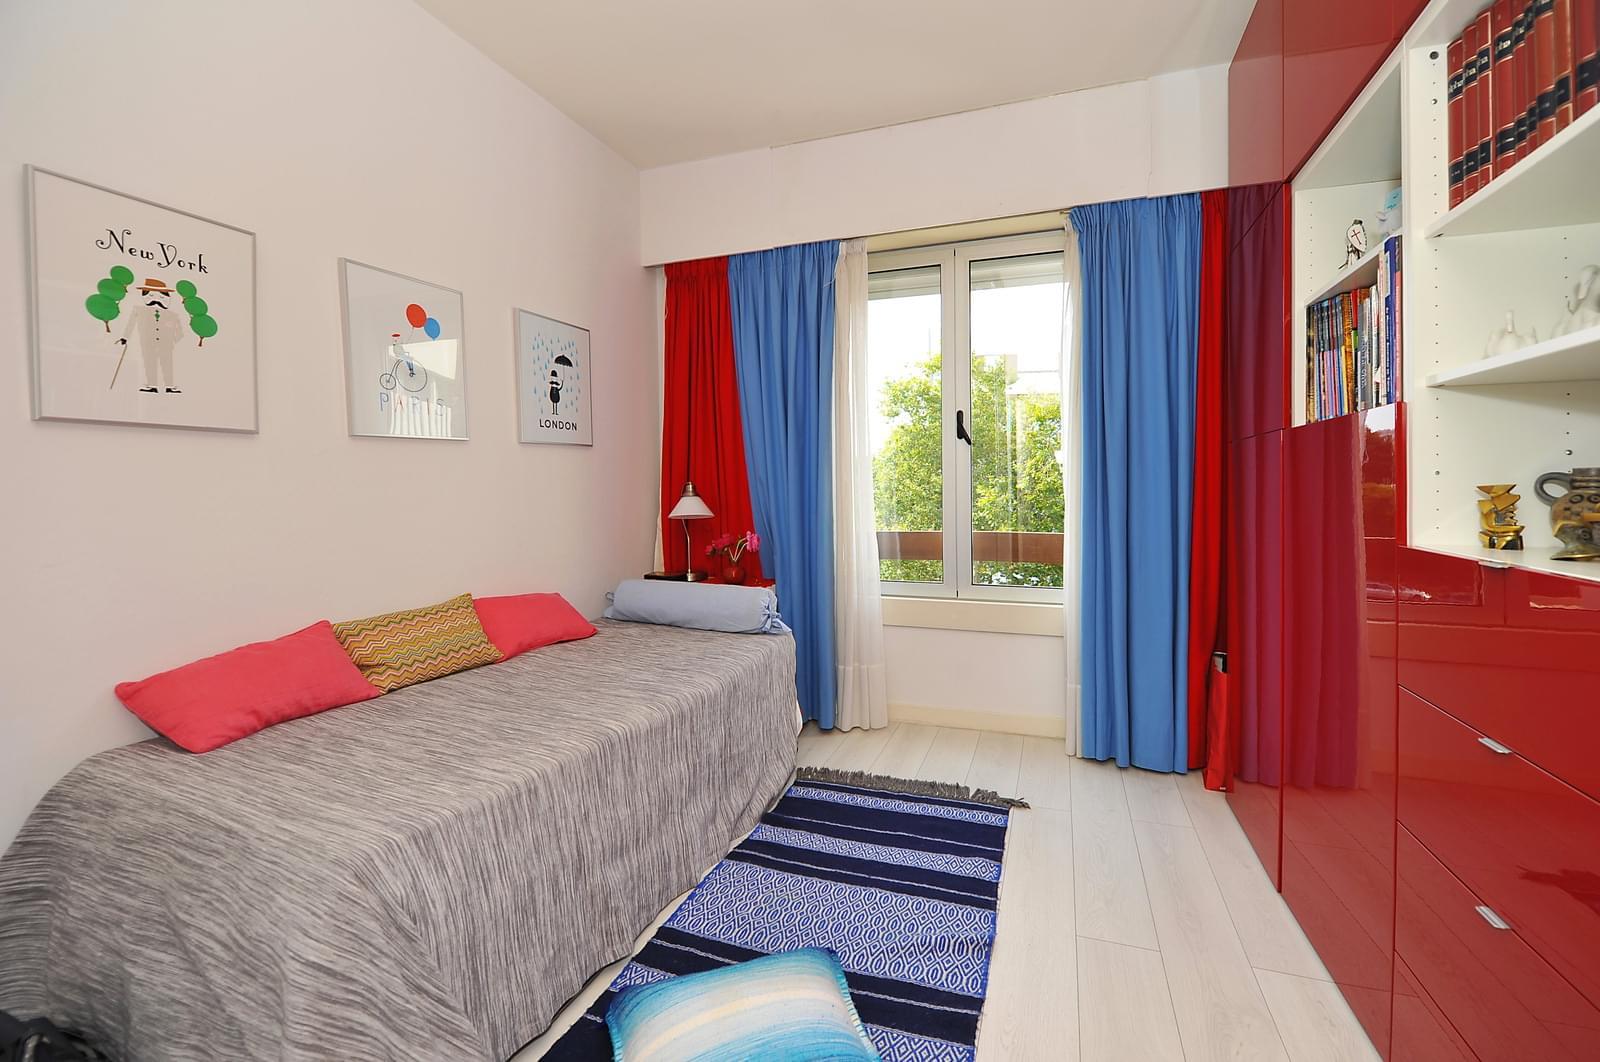 pf17939-apartamento-t4-1-oeiras-dbc0035b-223d-4a56-a398-cc1a91d1c85c